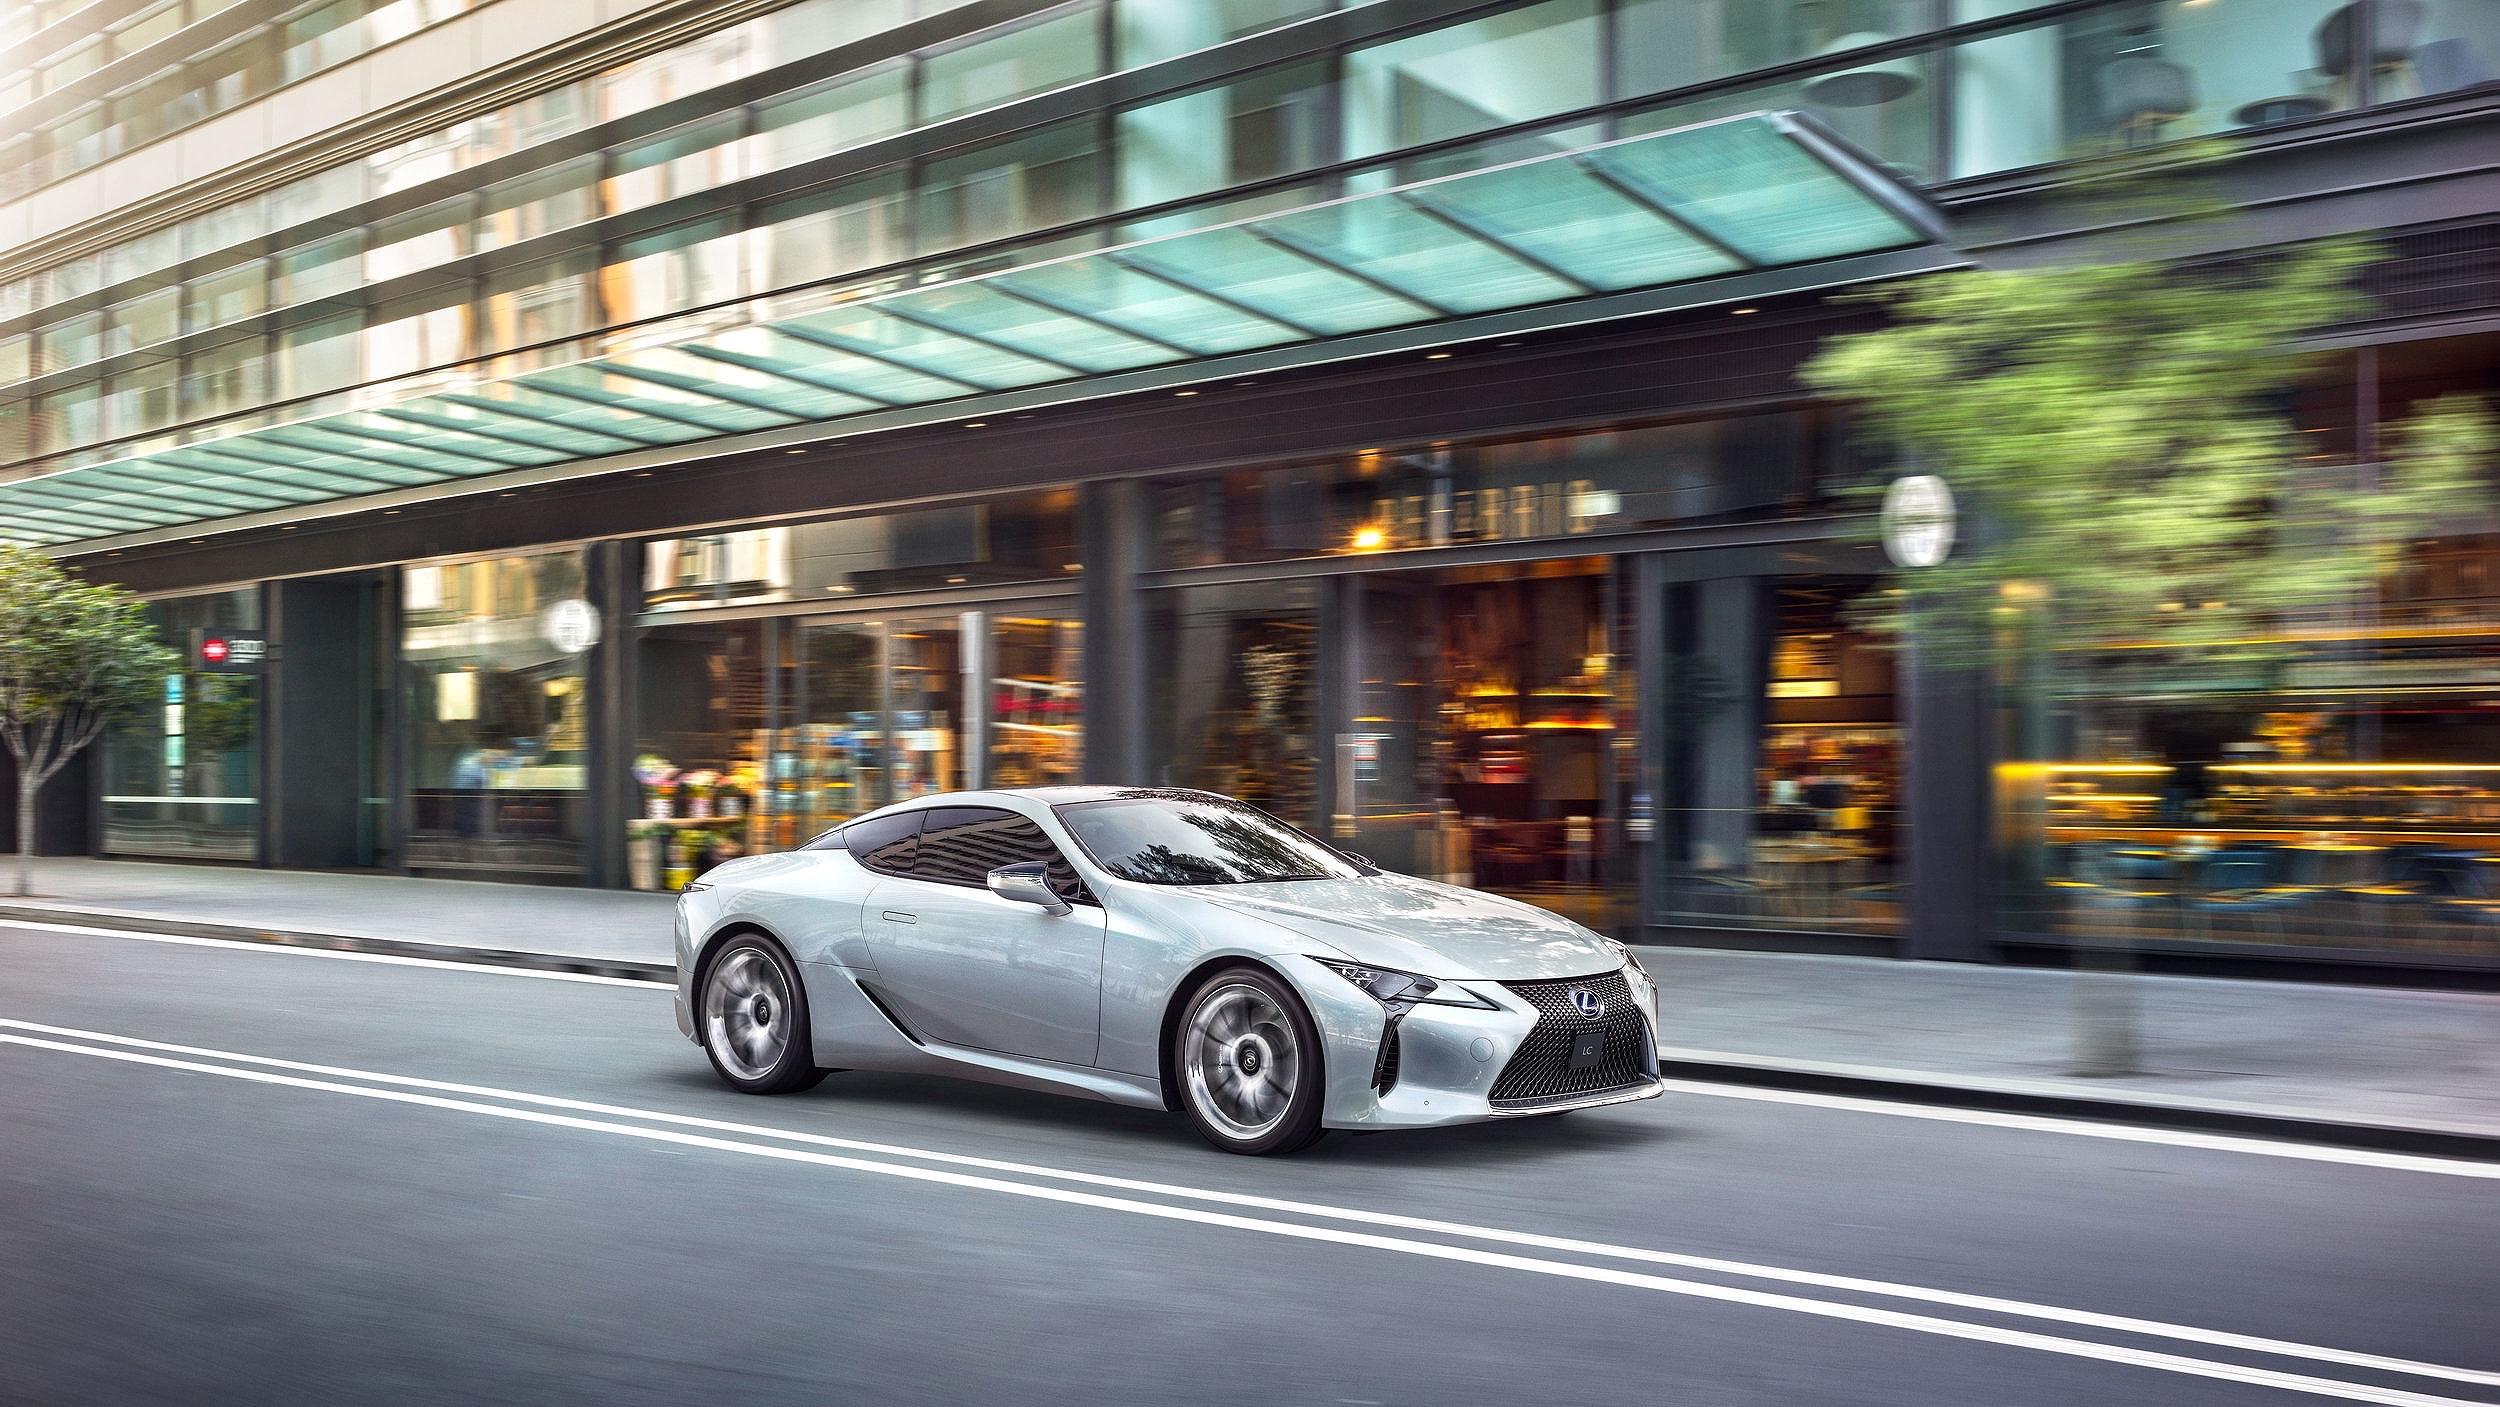 Lexus-visual1_v03_less-contrast.jpg